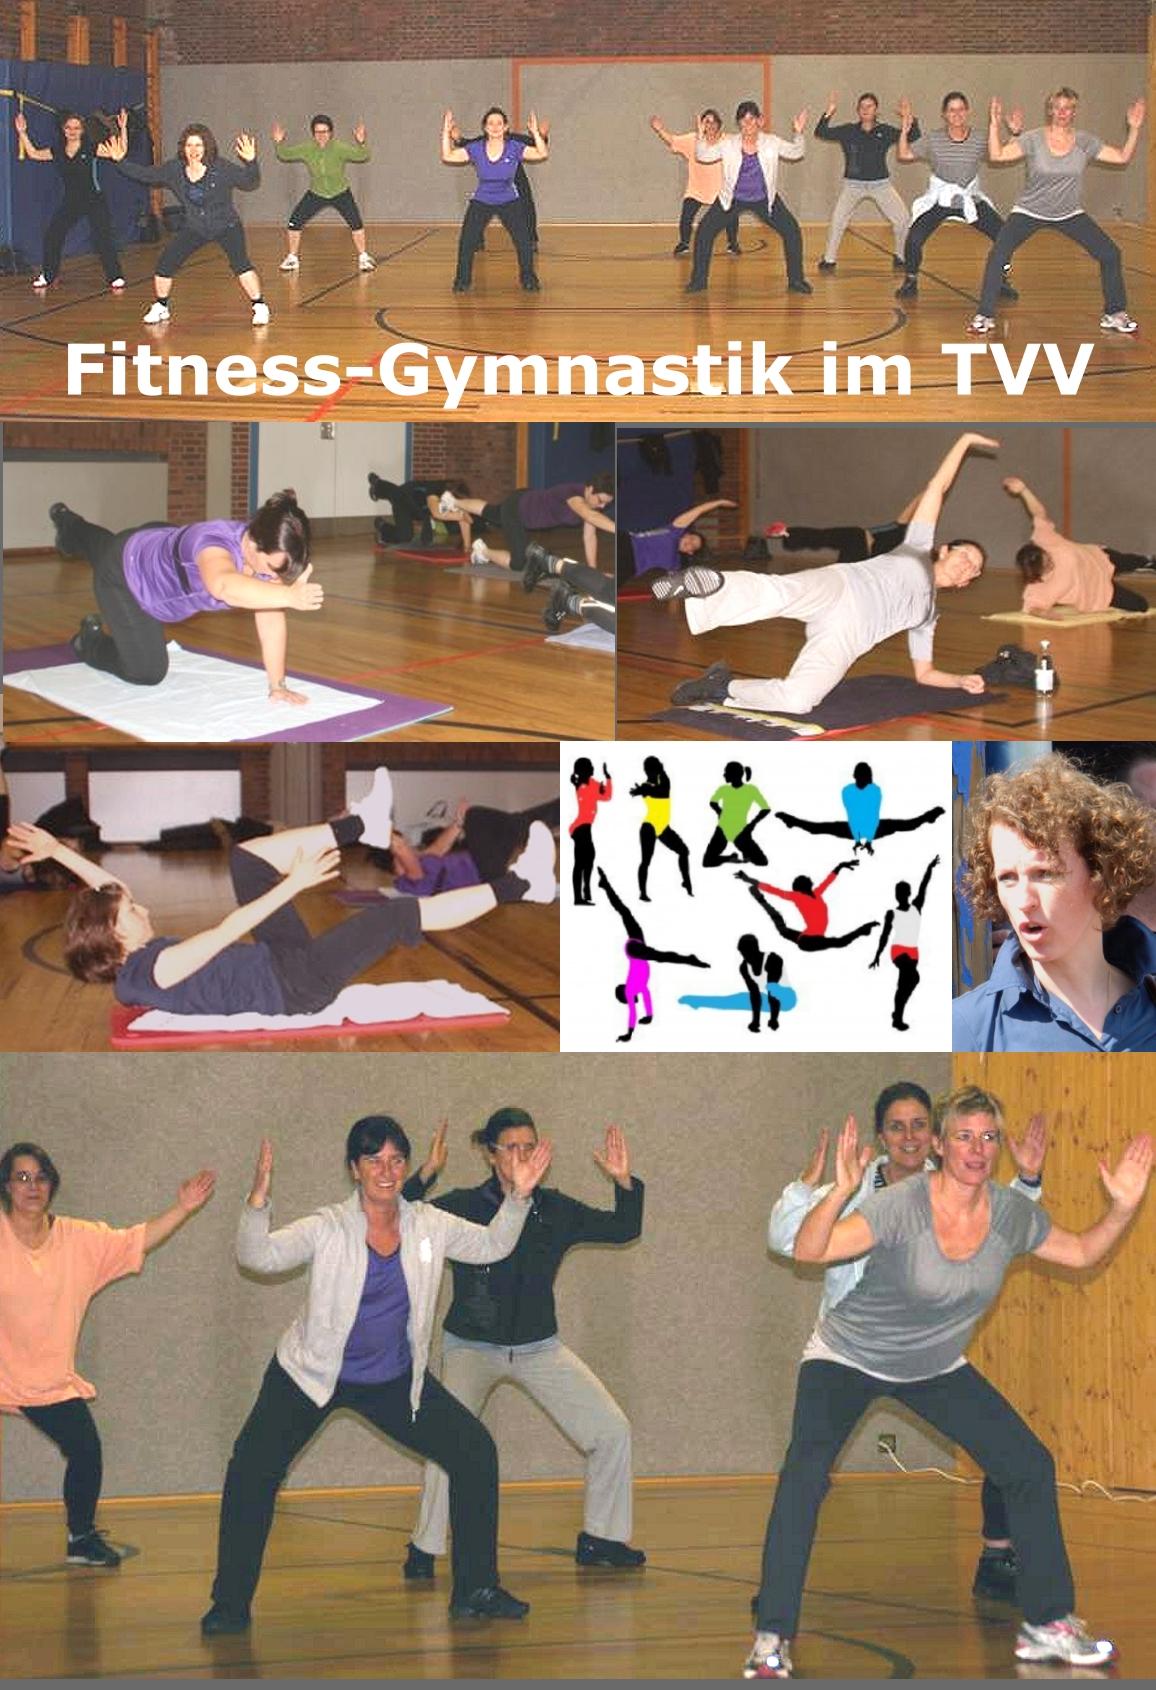 Fitnessgymnastik LIVE